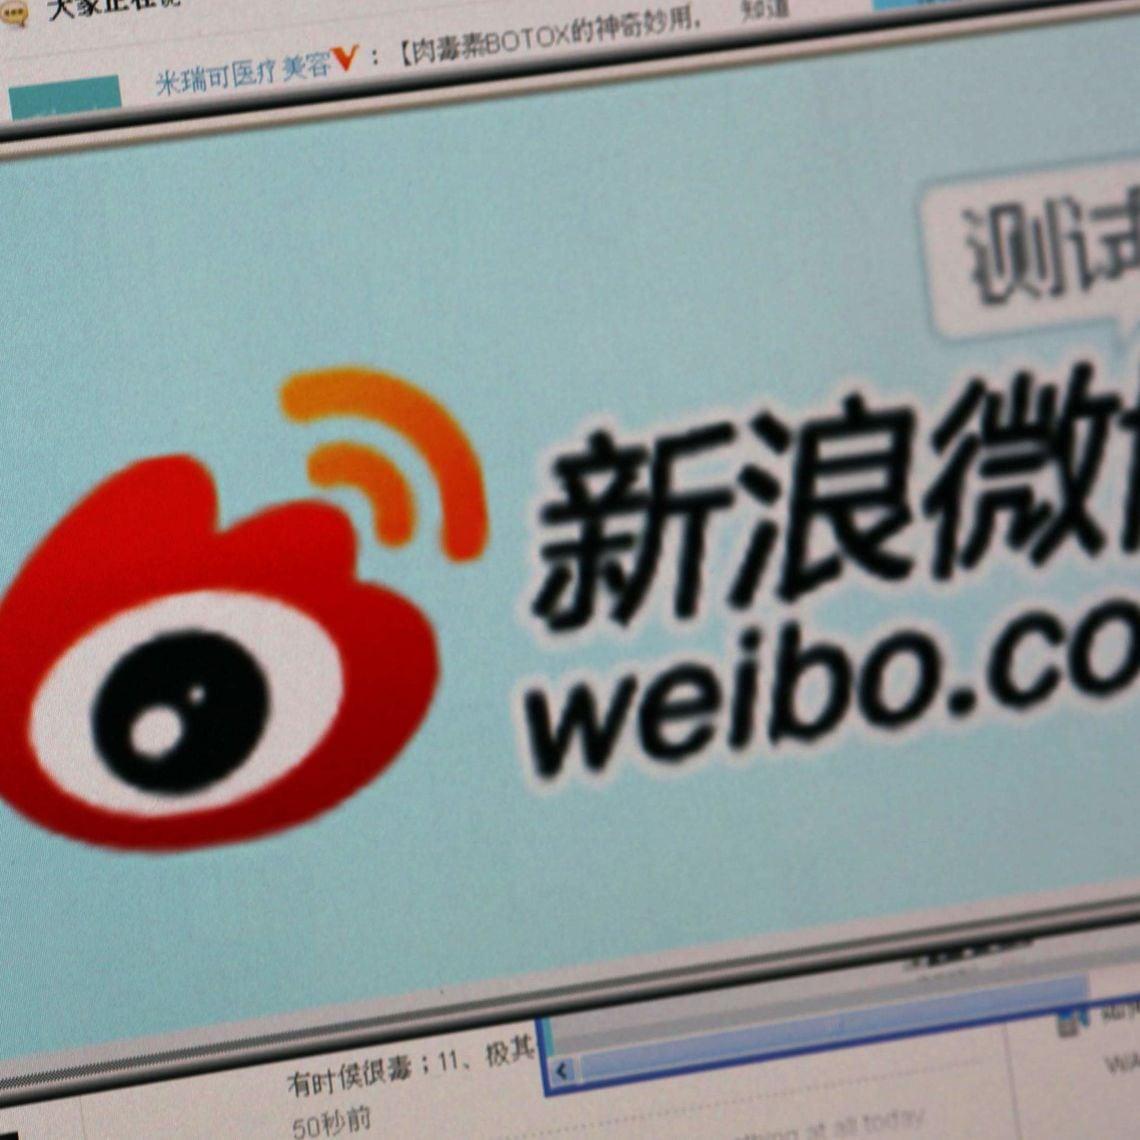 weibo quadr